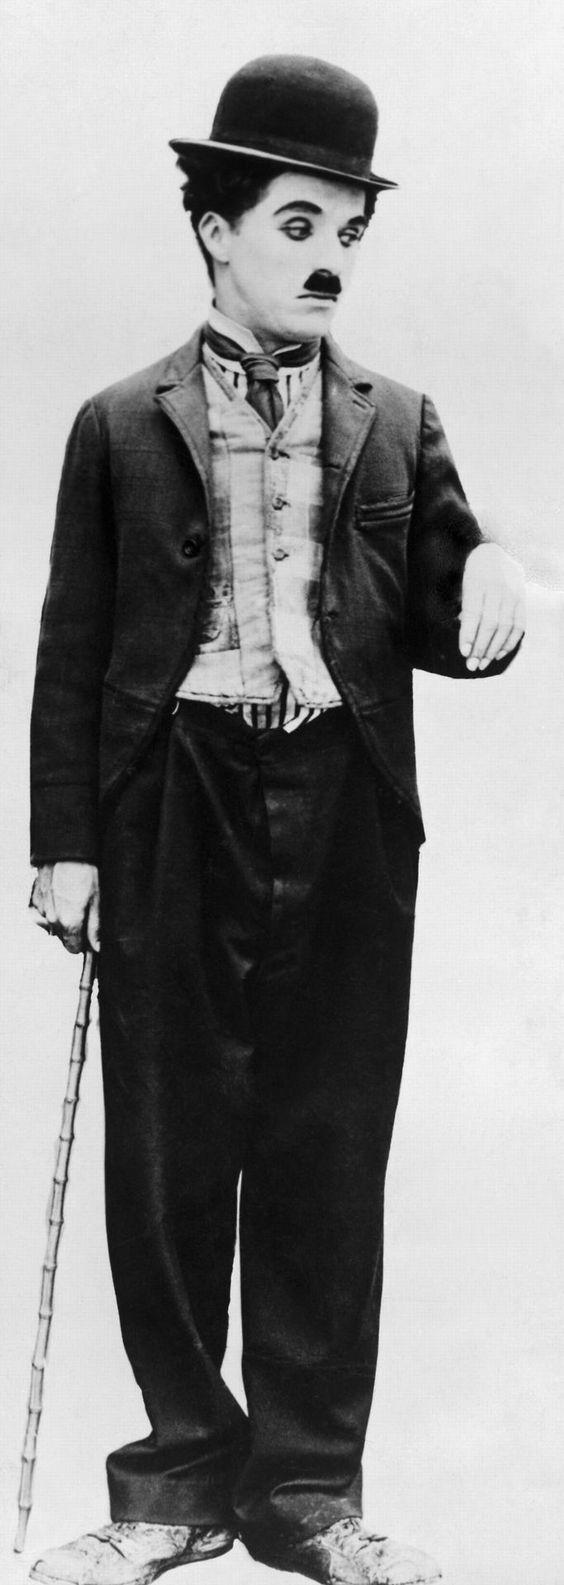 Moda: charlie chaplin 1889 ~ 1977